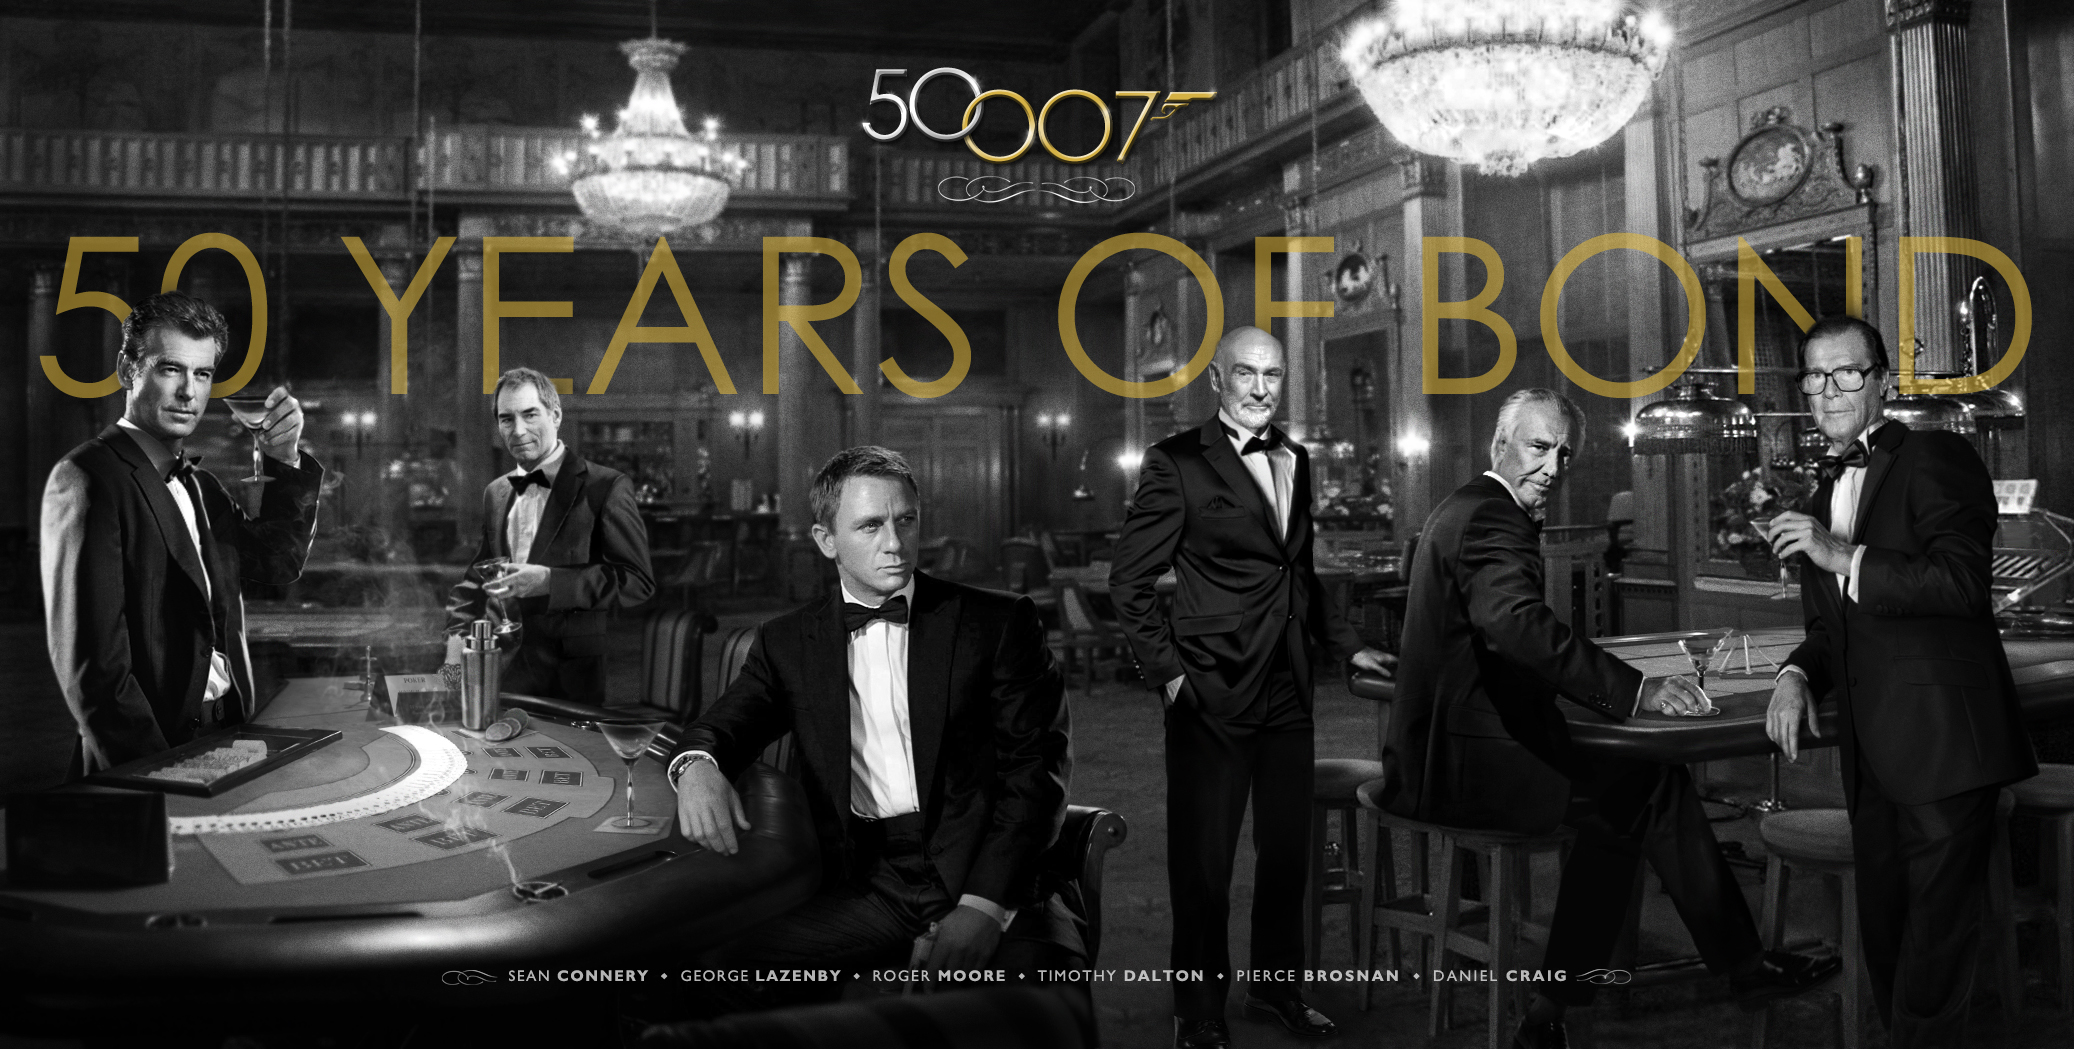 bond_50___50_years_of_bond_by_themadbutcher-d5dy0xl.jpg